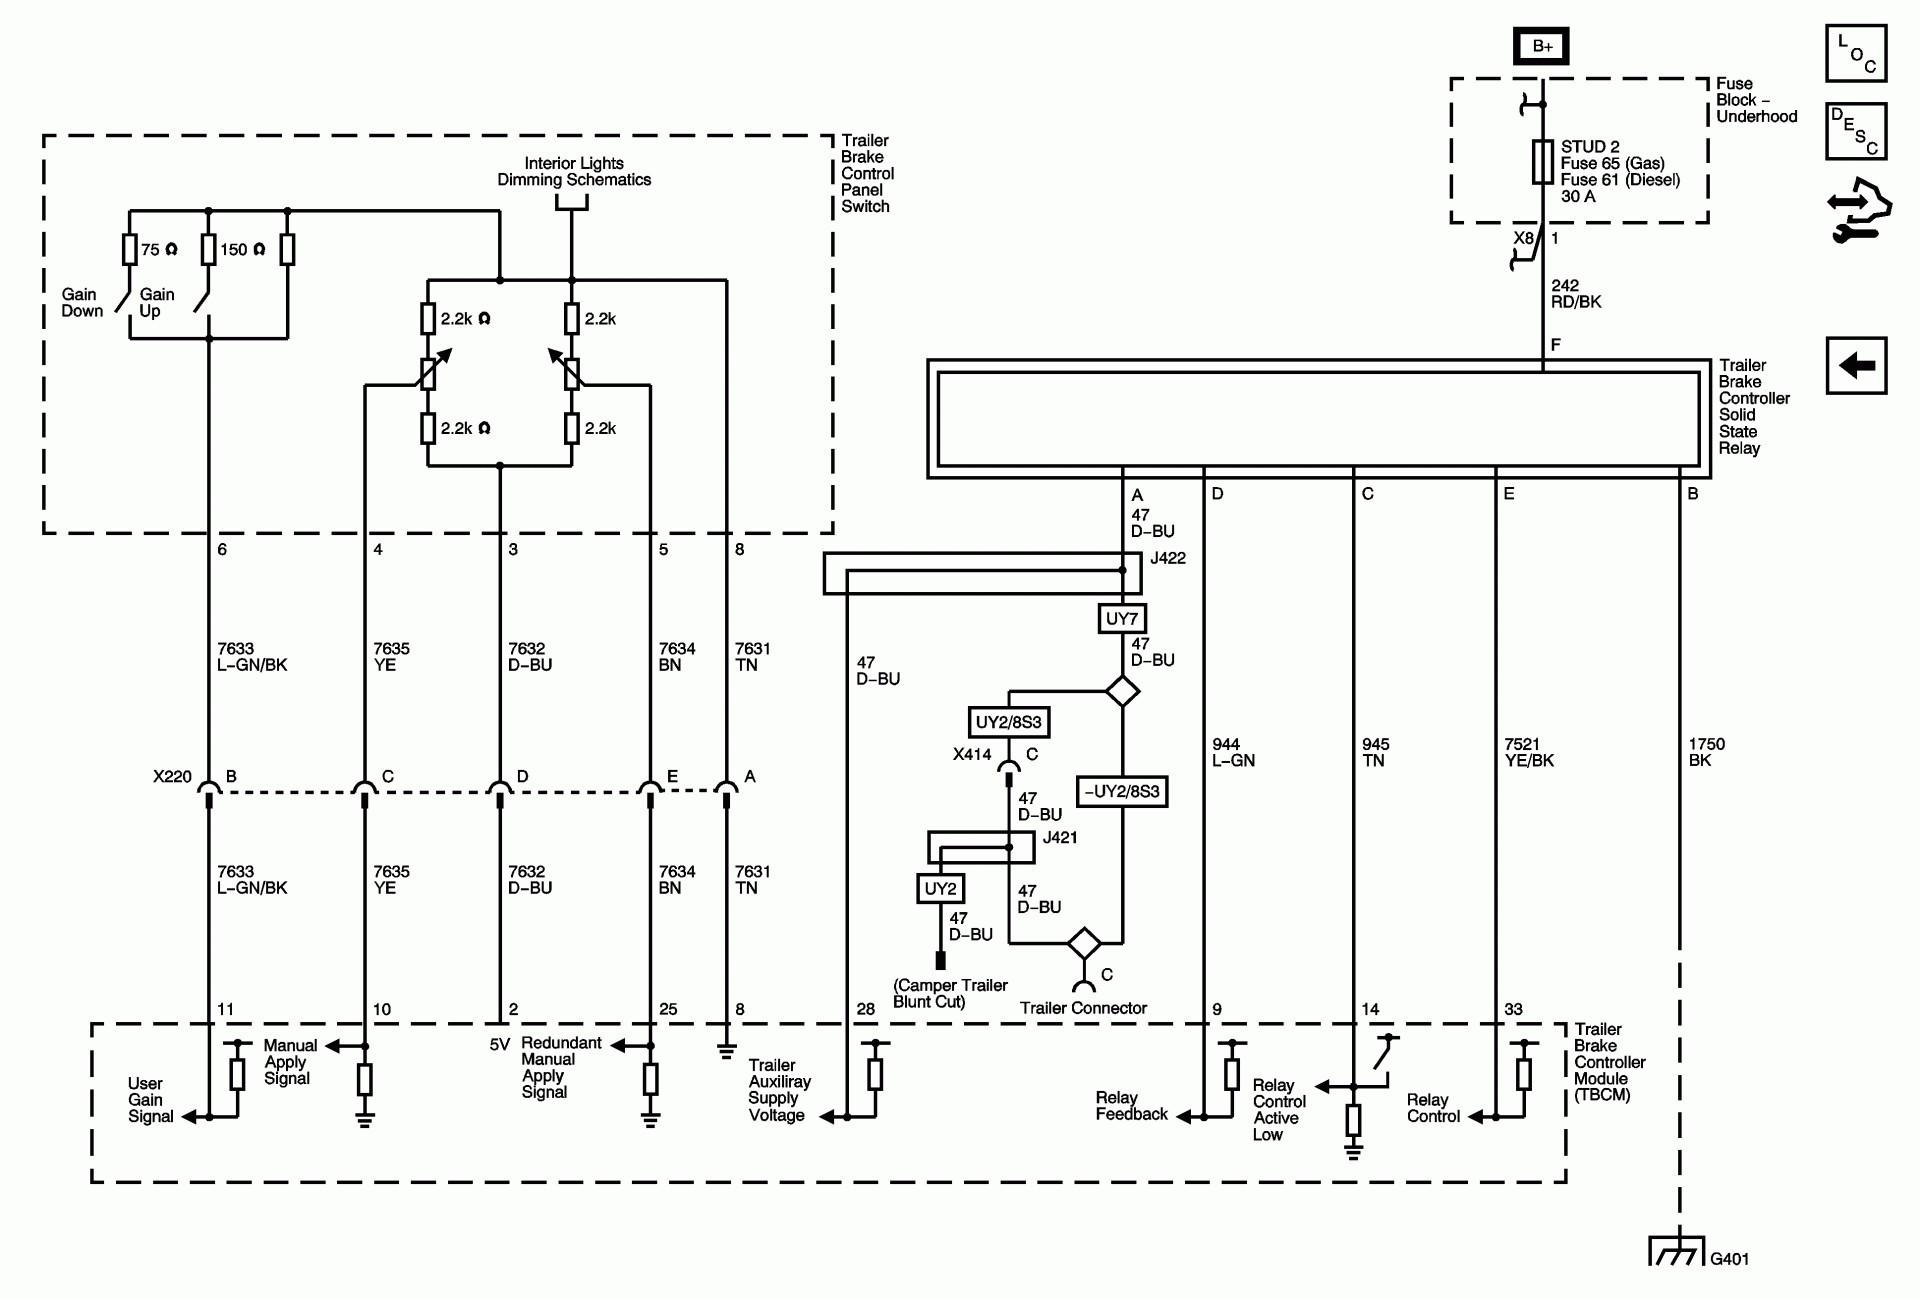 Wiring Diagram Trailer Brakes Refrence Tekonsharodigy2 Wiring Diagram With3  Trailer Brake Controller